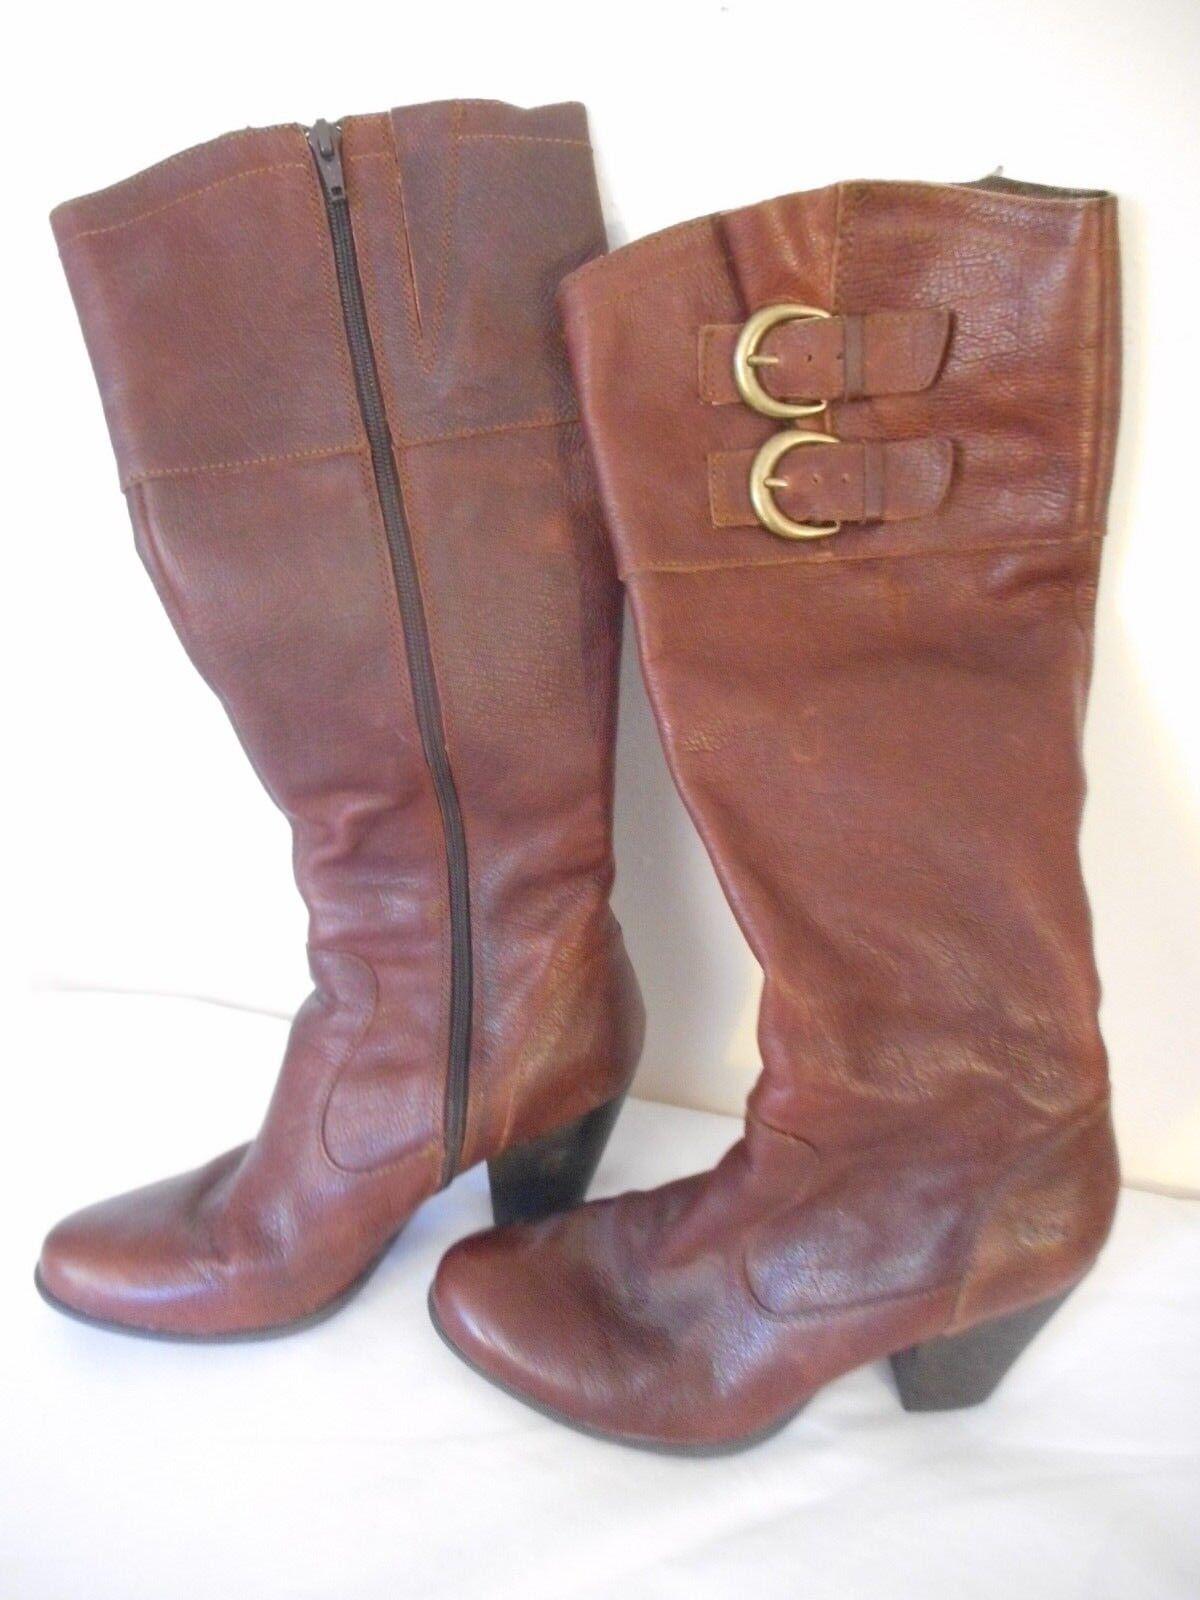 Born of Concept BOC Braun Leder 3.25 inch heel Boot Größe 6.5  buckle accents